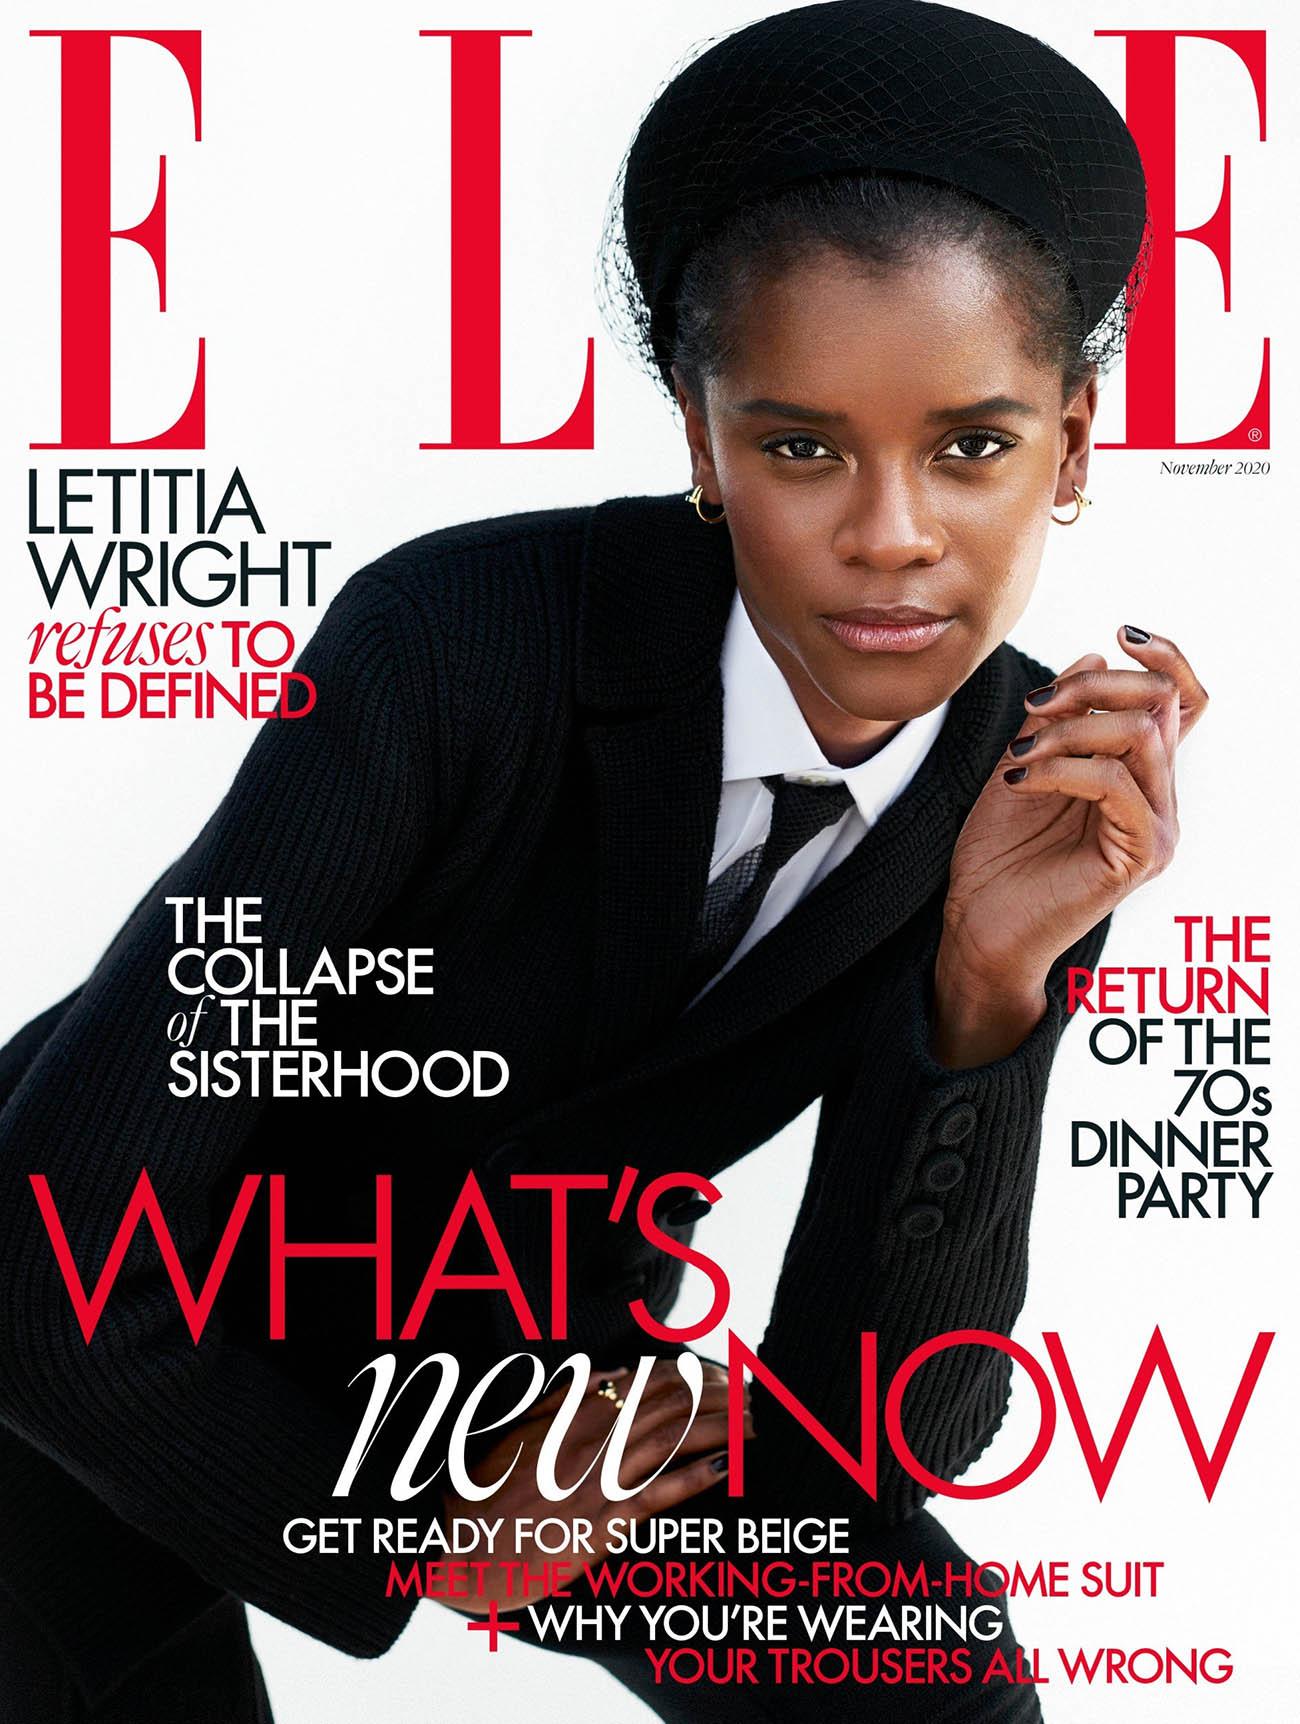 Letitia Wright covers Elle UK November 2020 by Marcin Kempski